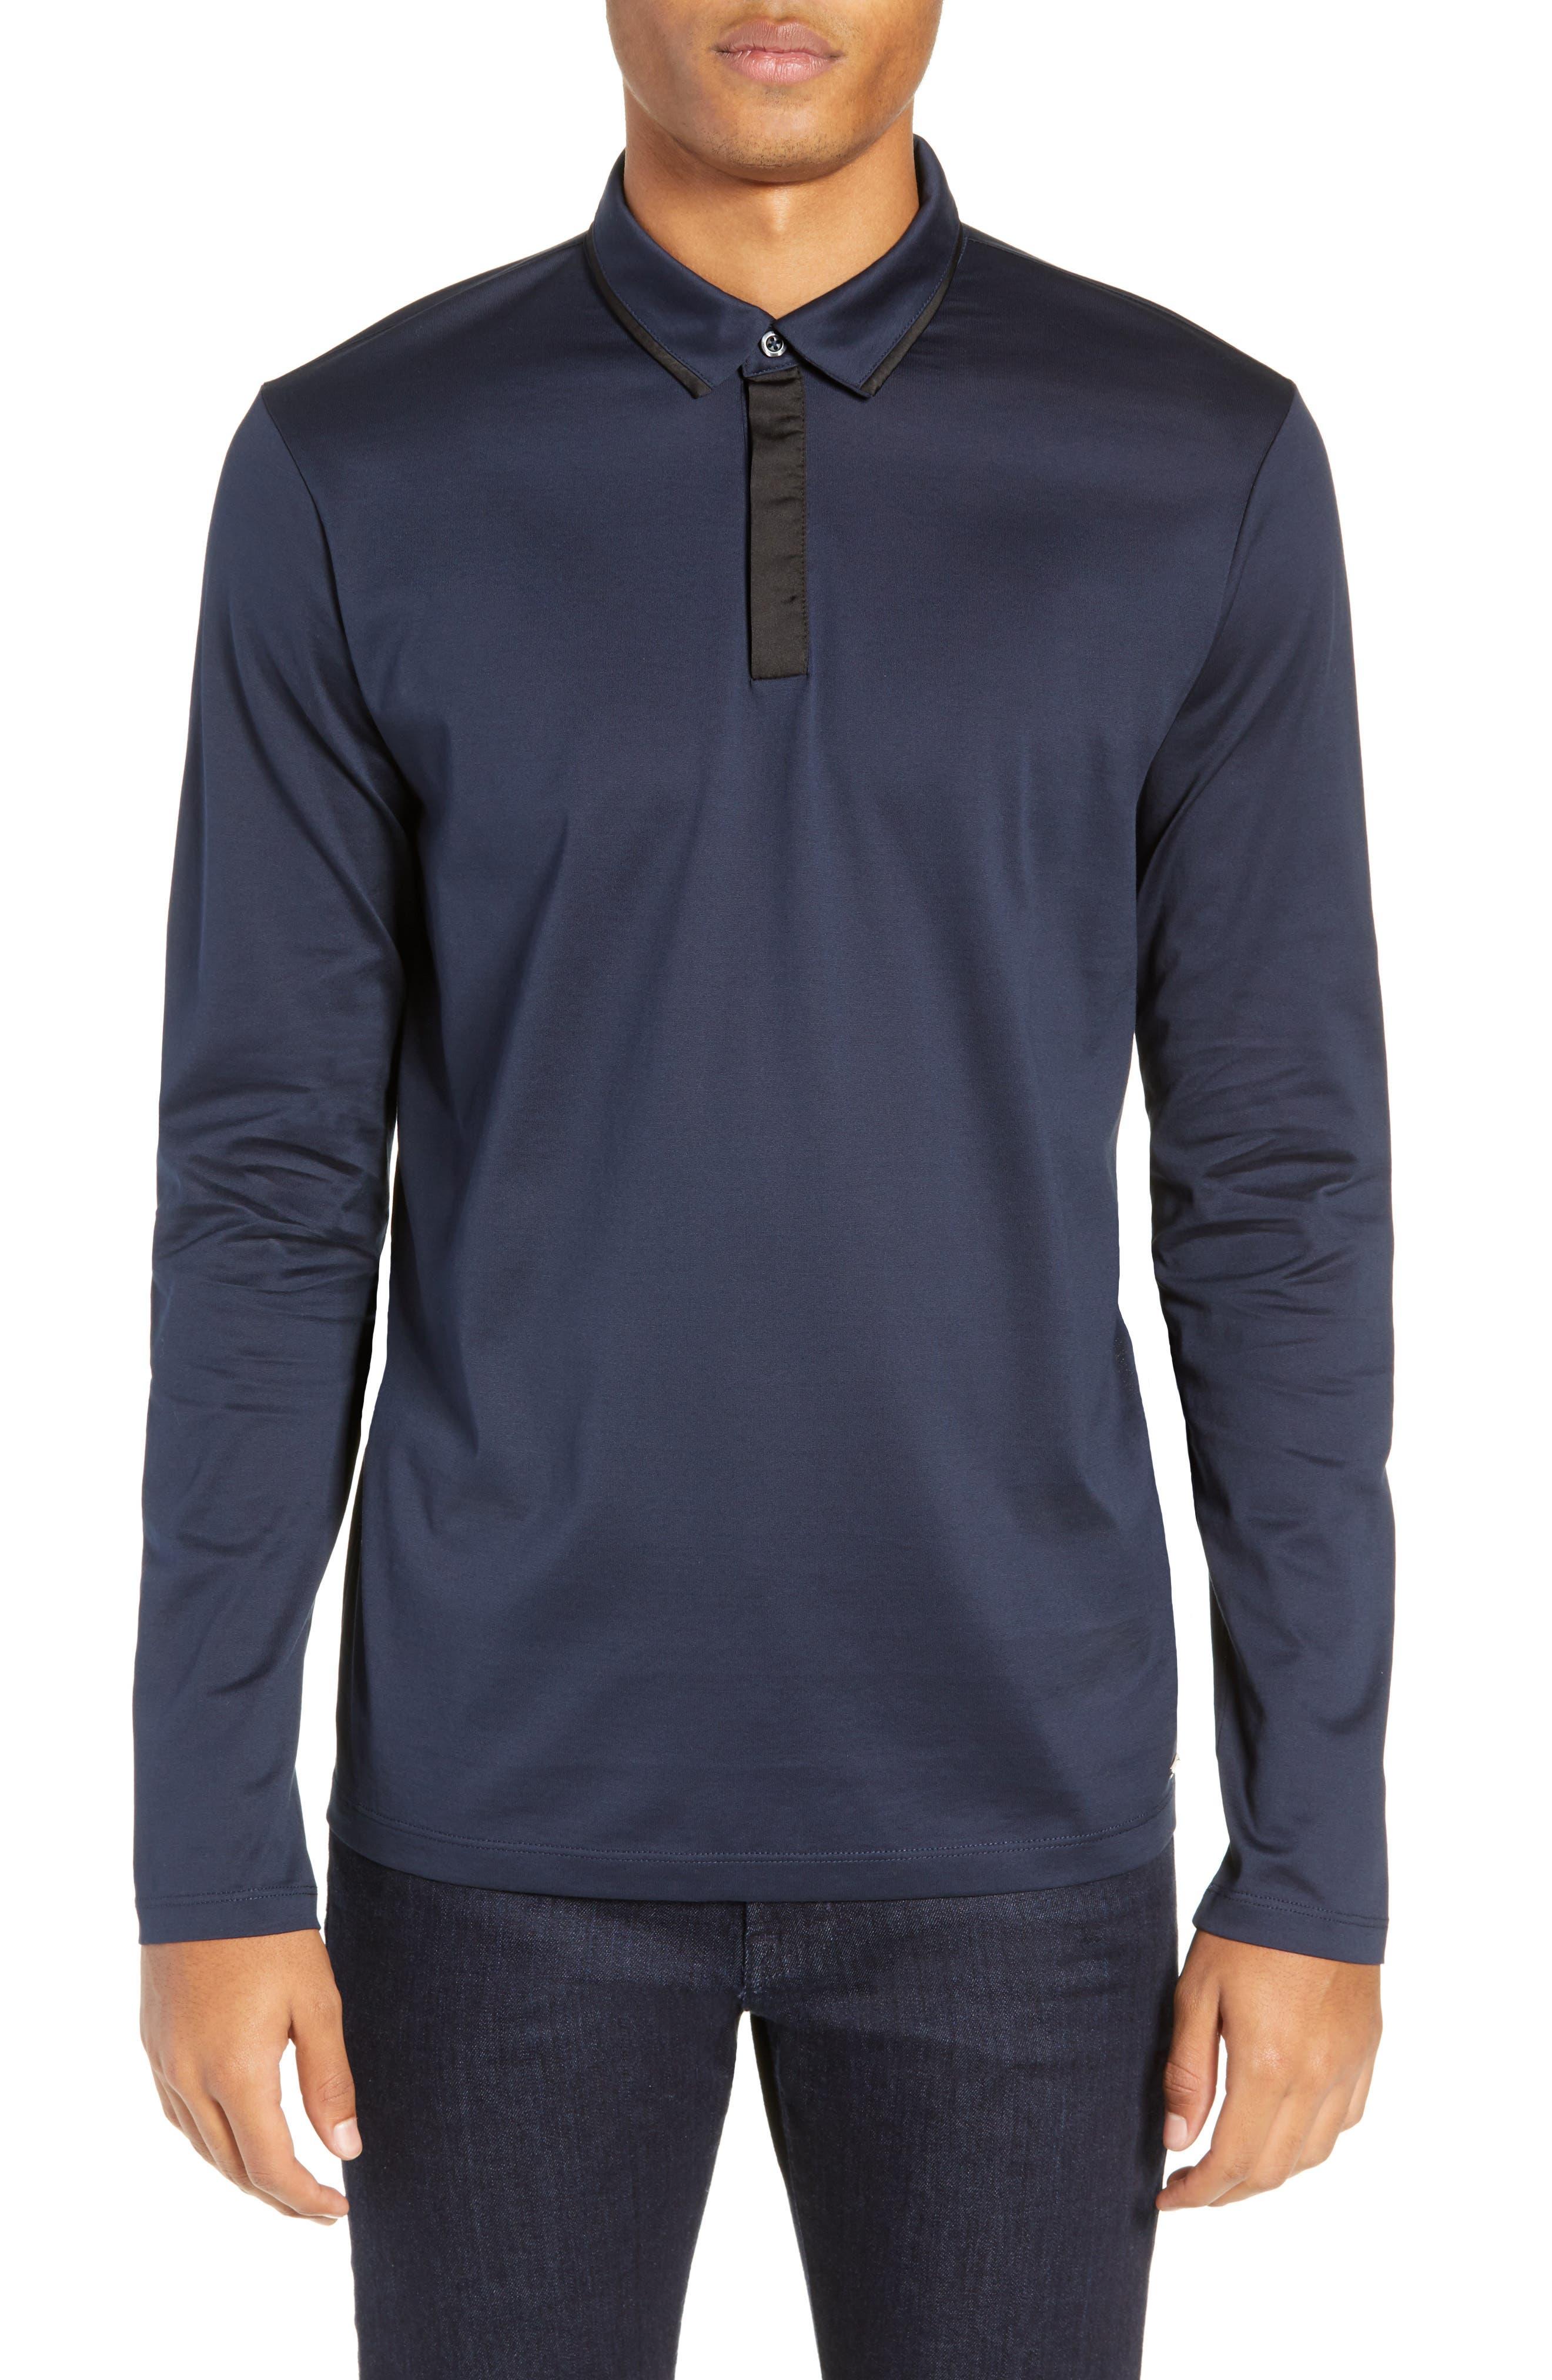 Dalendar Mercerized Cotton Slim Fit Polo Shirt,                             Main thumbnail 1, color,                             BLUE